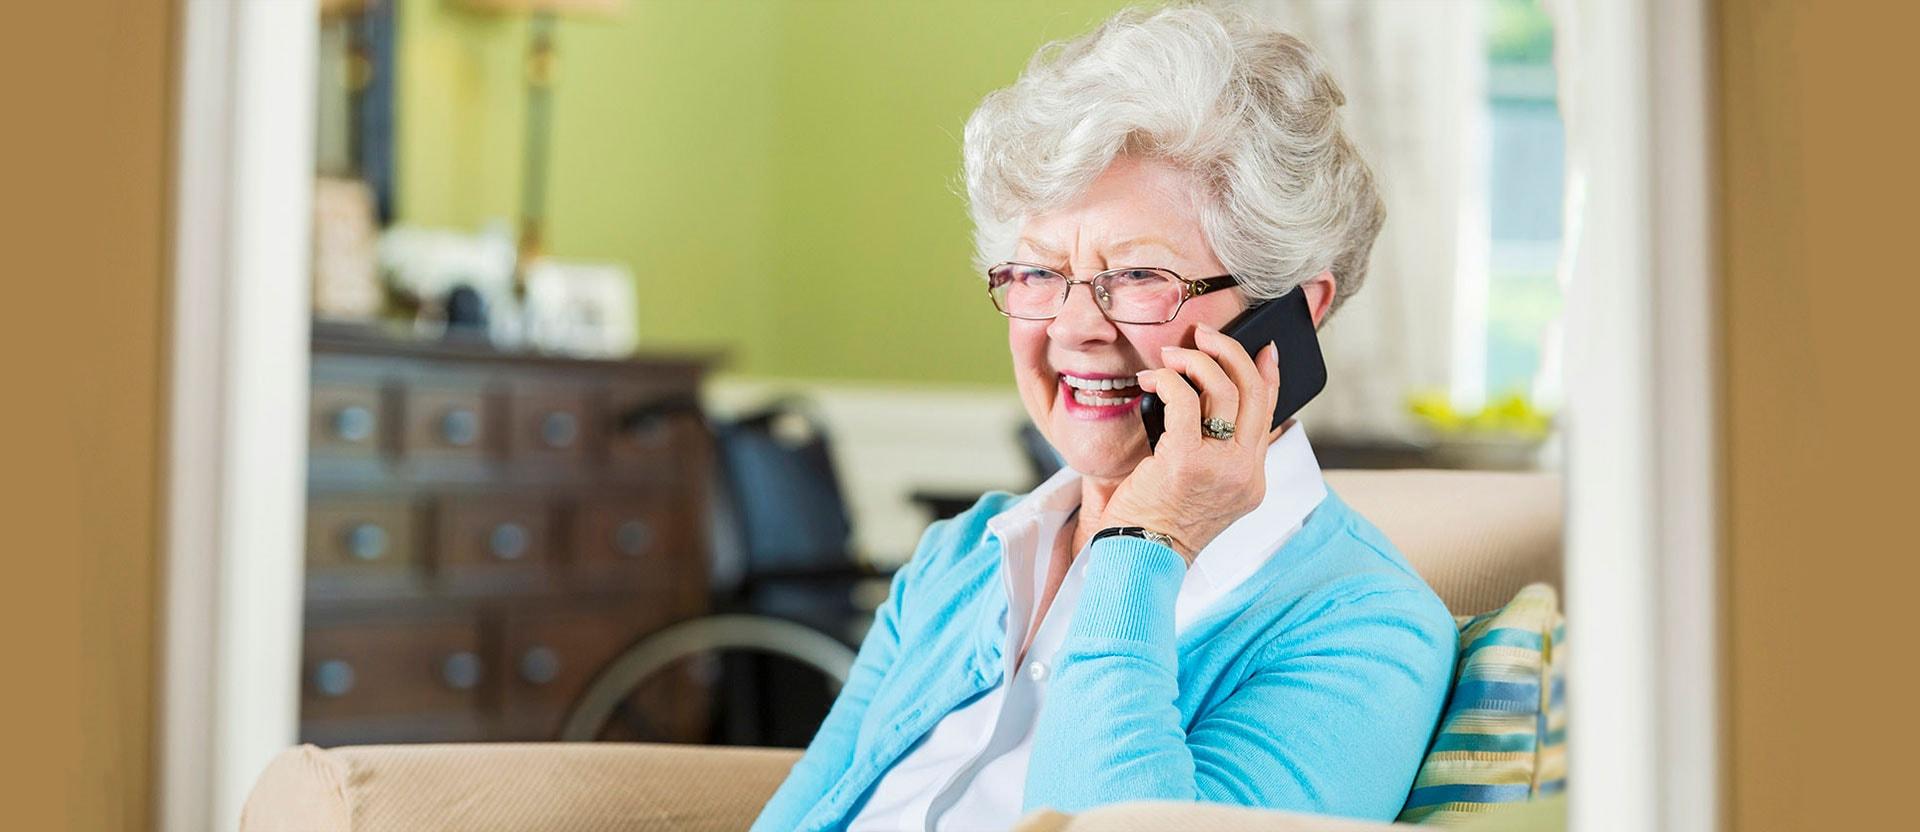 Foto ilustrativa de uma idosa ao telefone